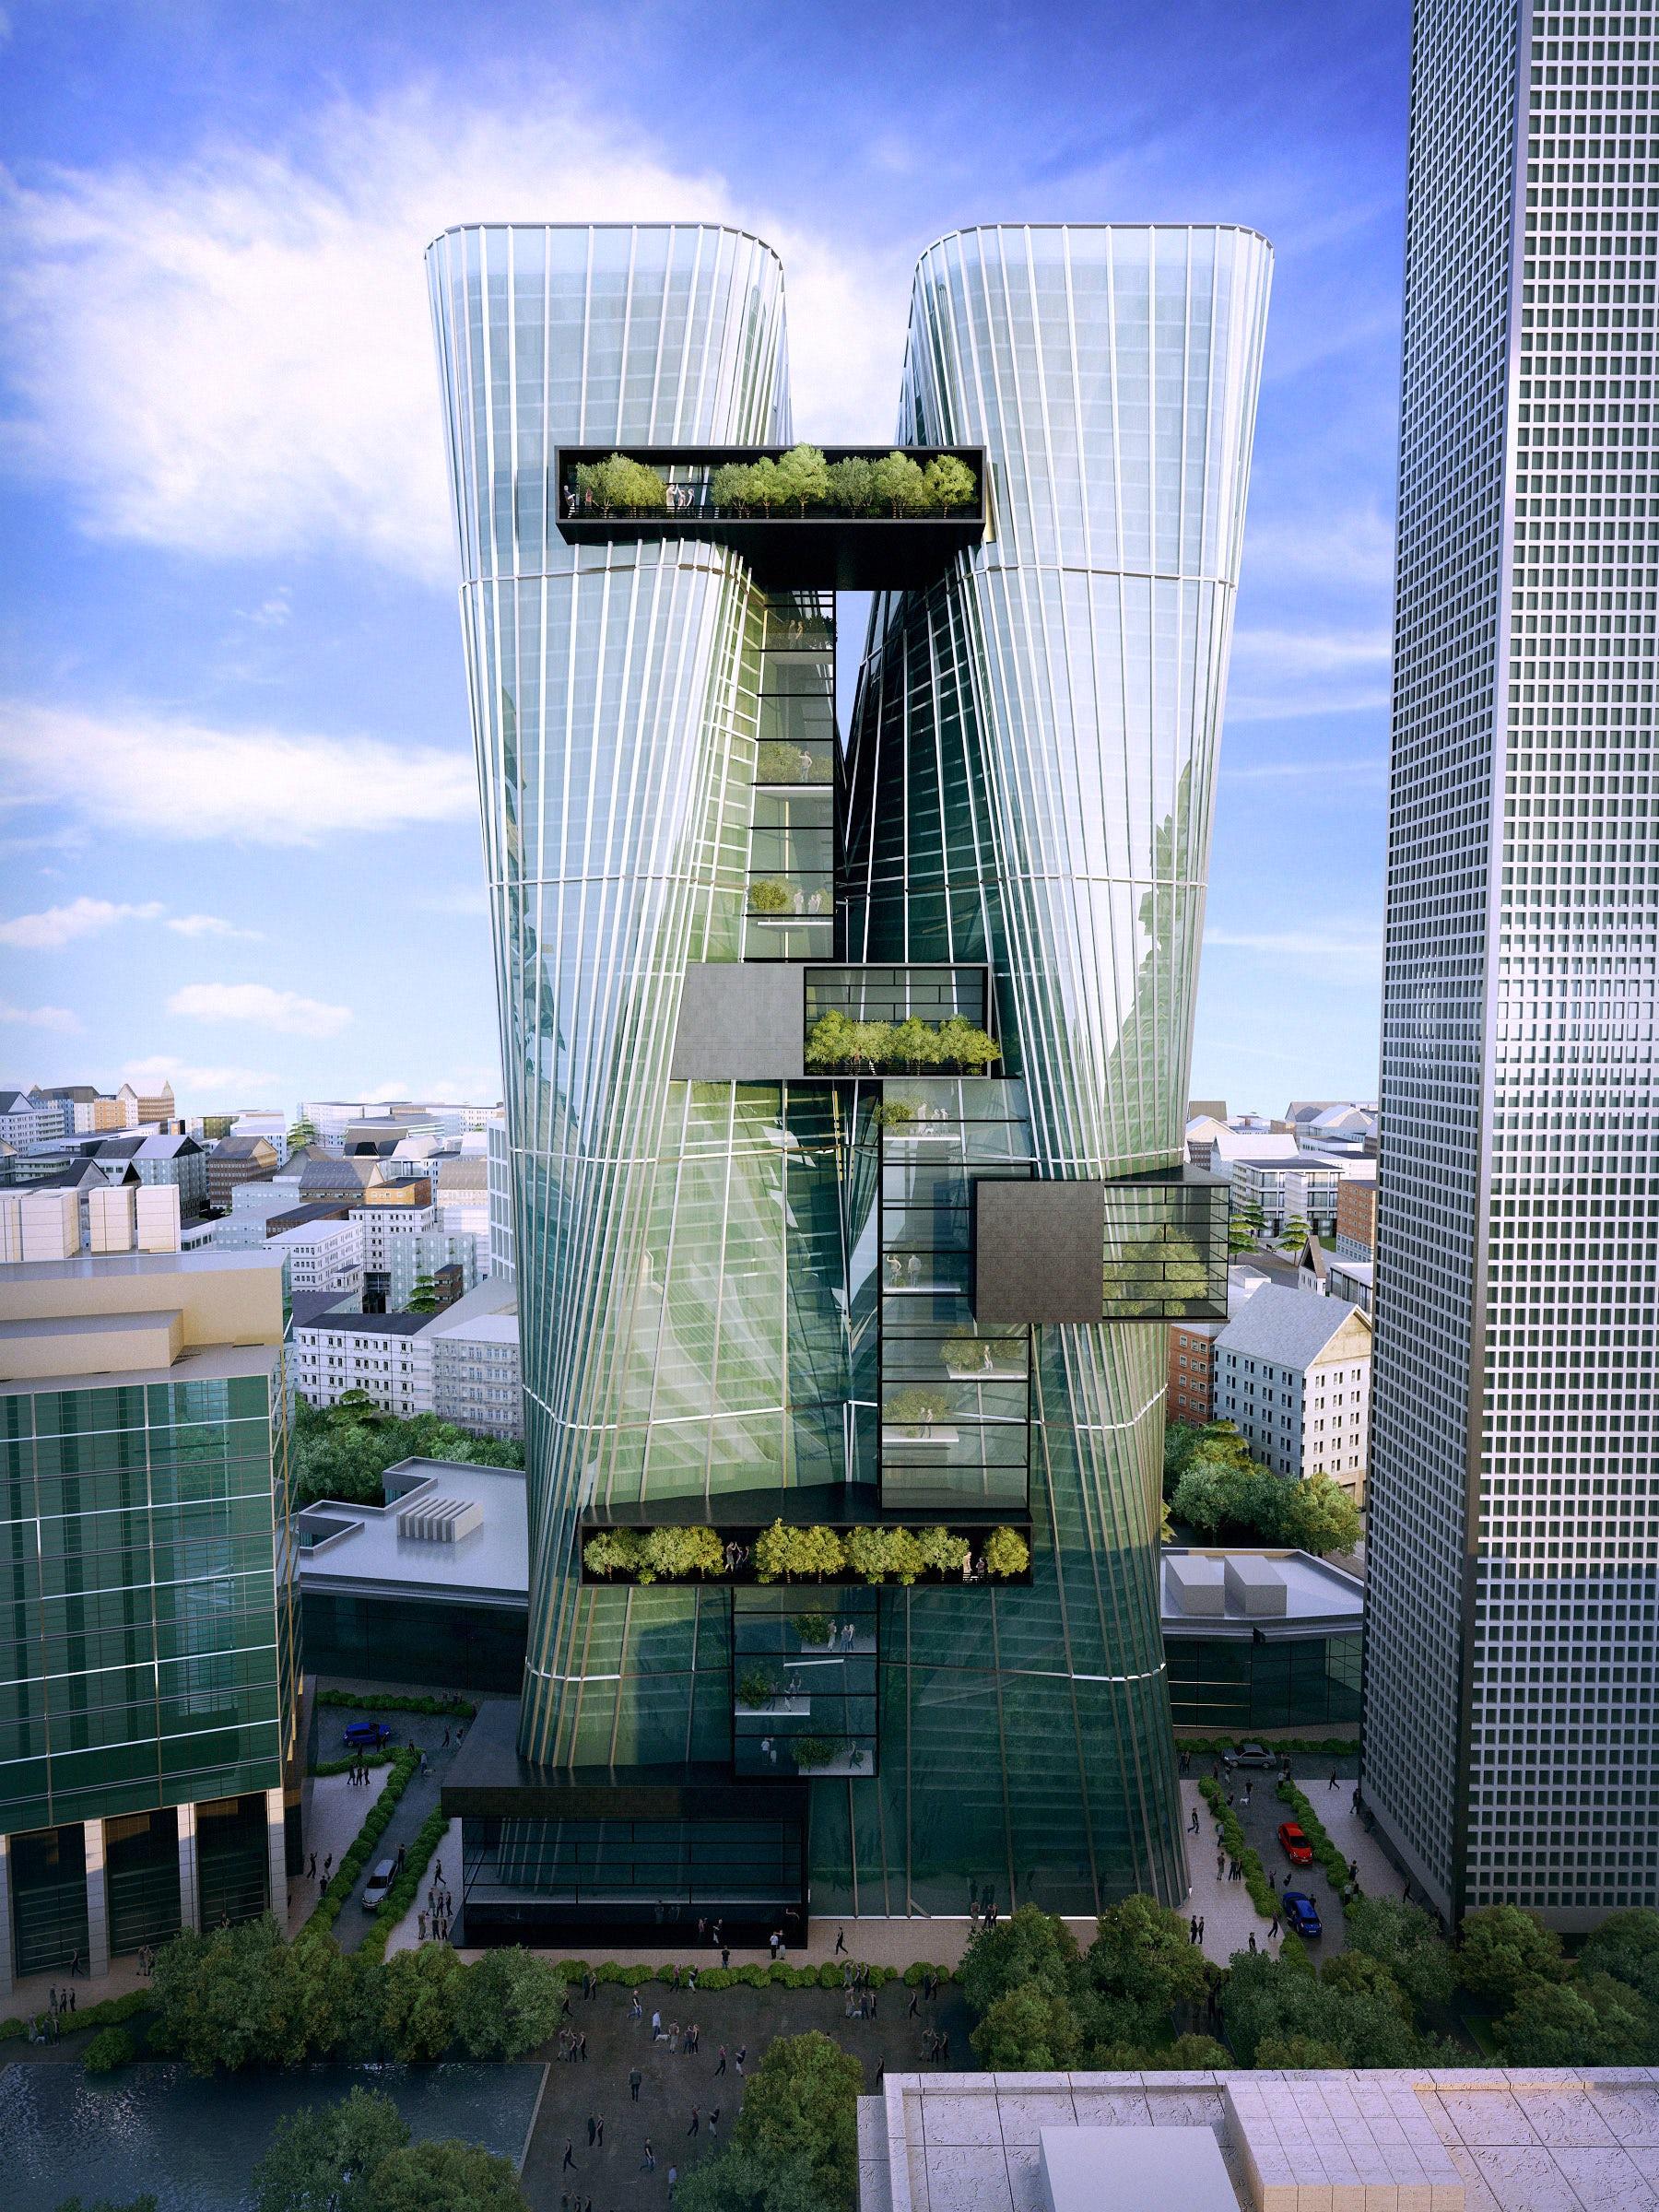 Urban Office Architecture: URBAN OFFICE ARCHITECTURE